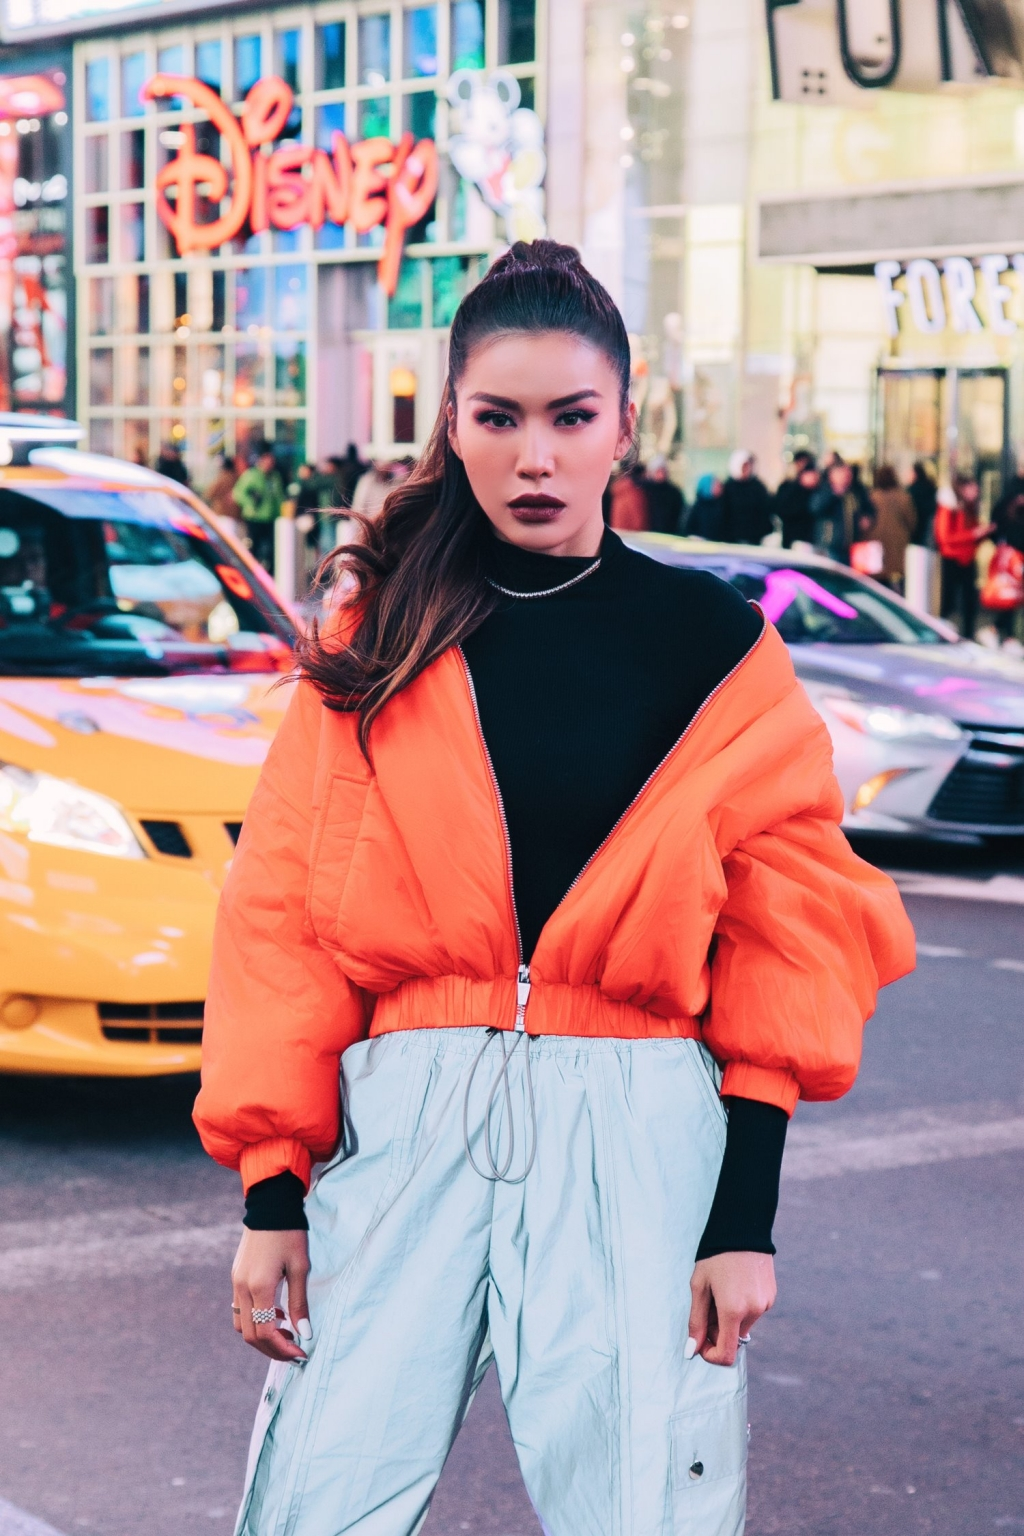 minh tu khoe loat anh street style sanh dieu khi tham du new york fashion week 2020